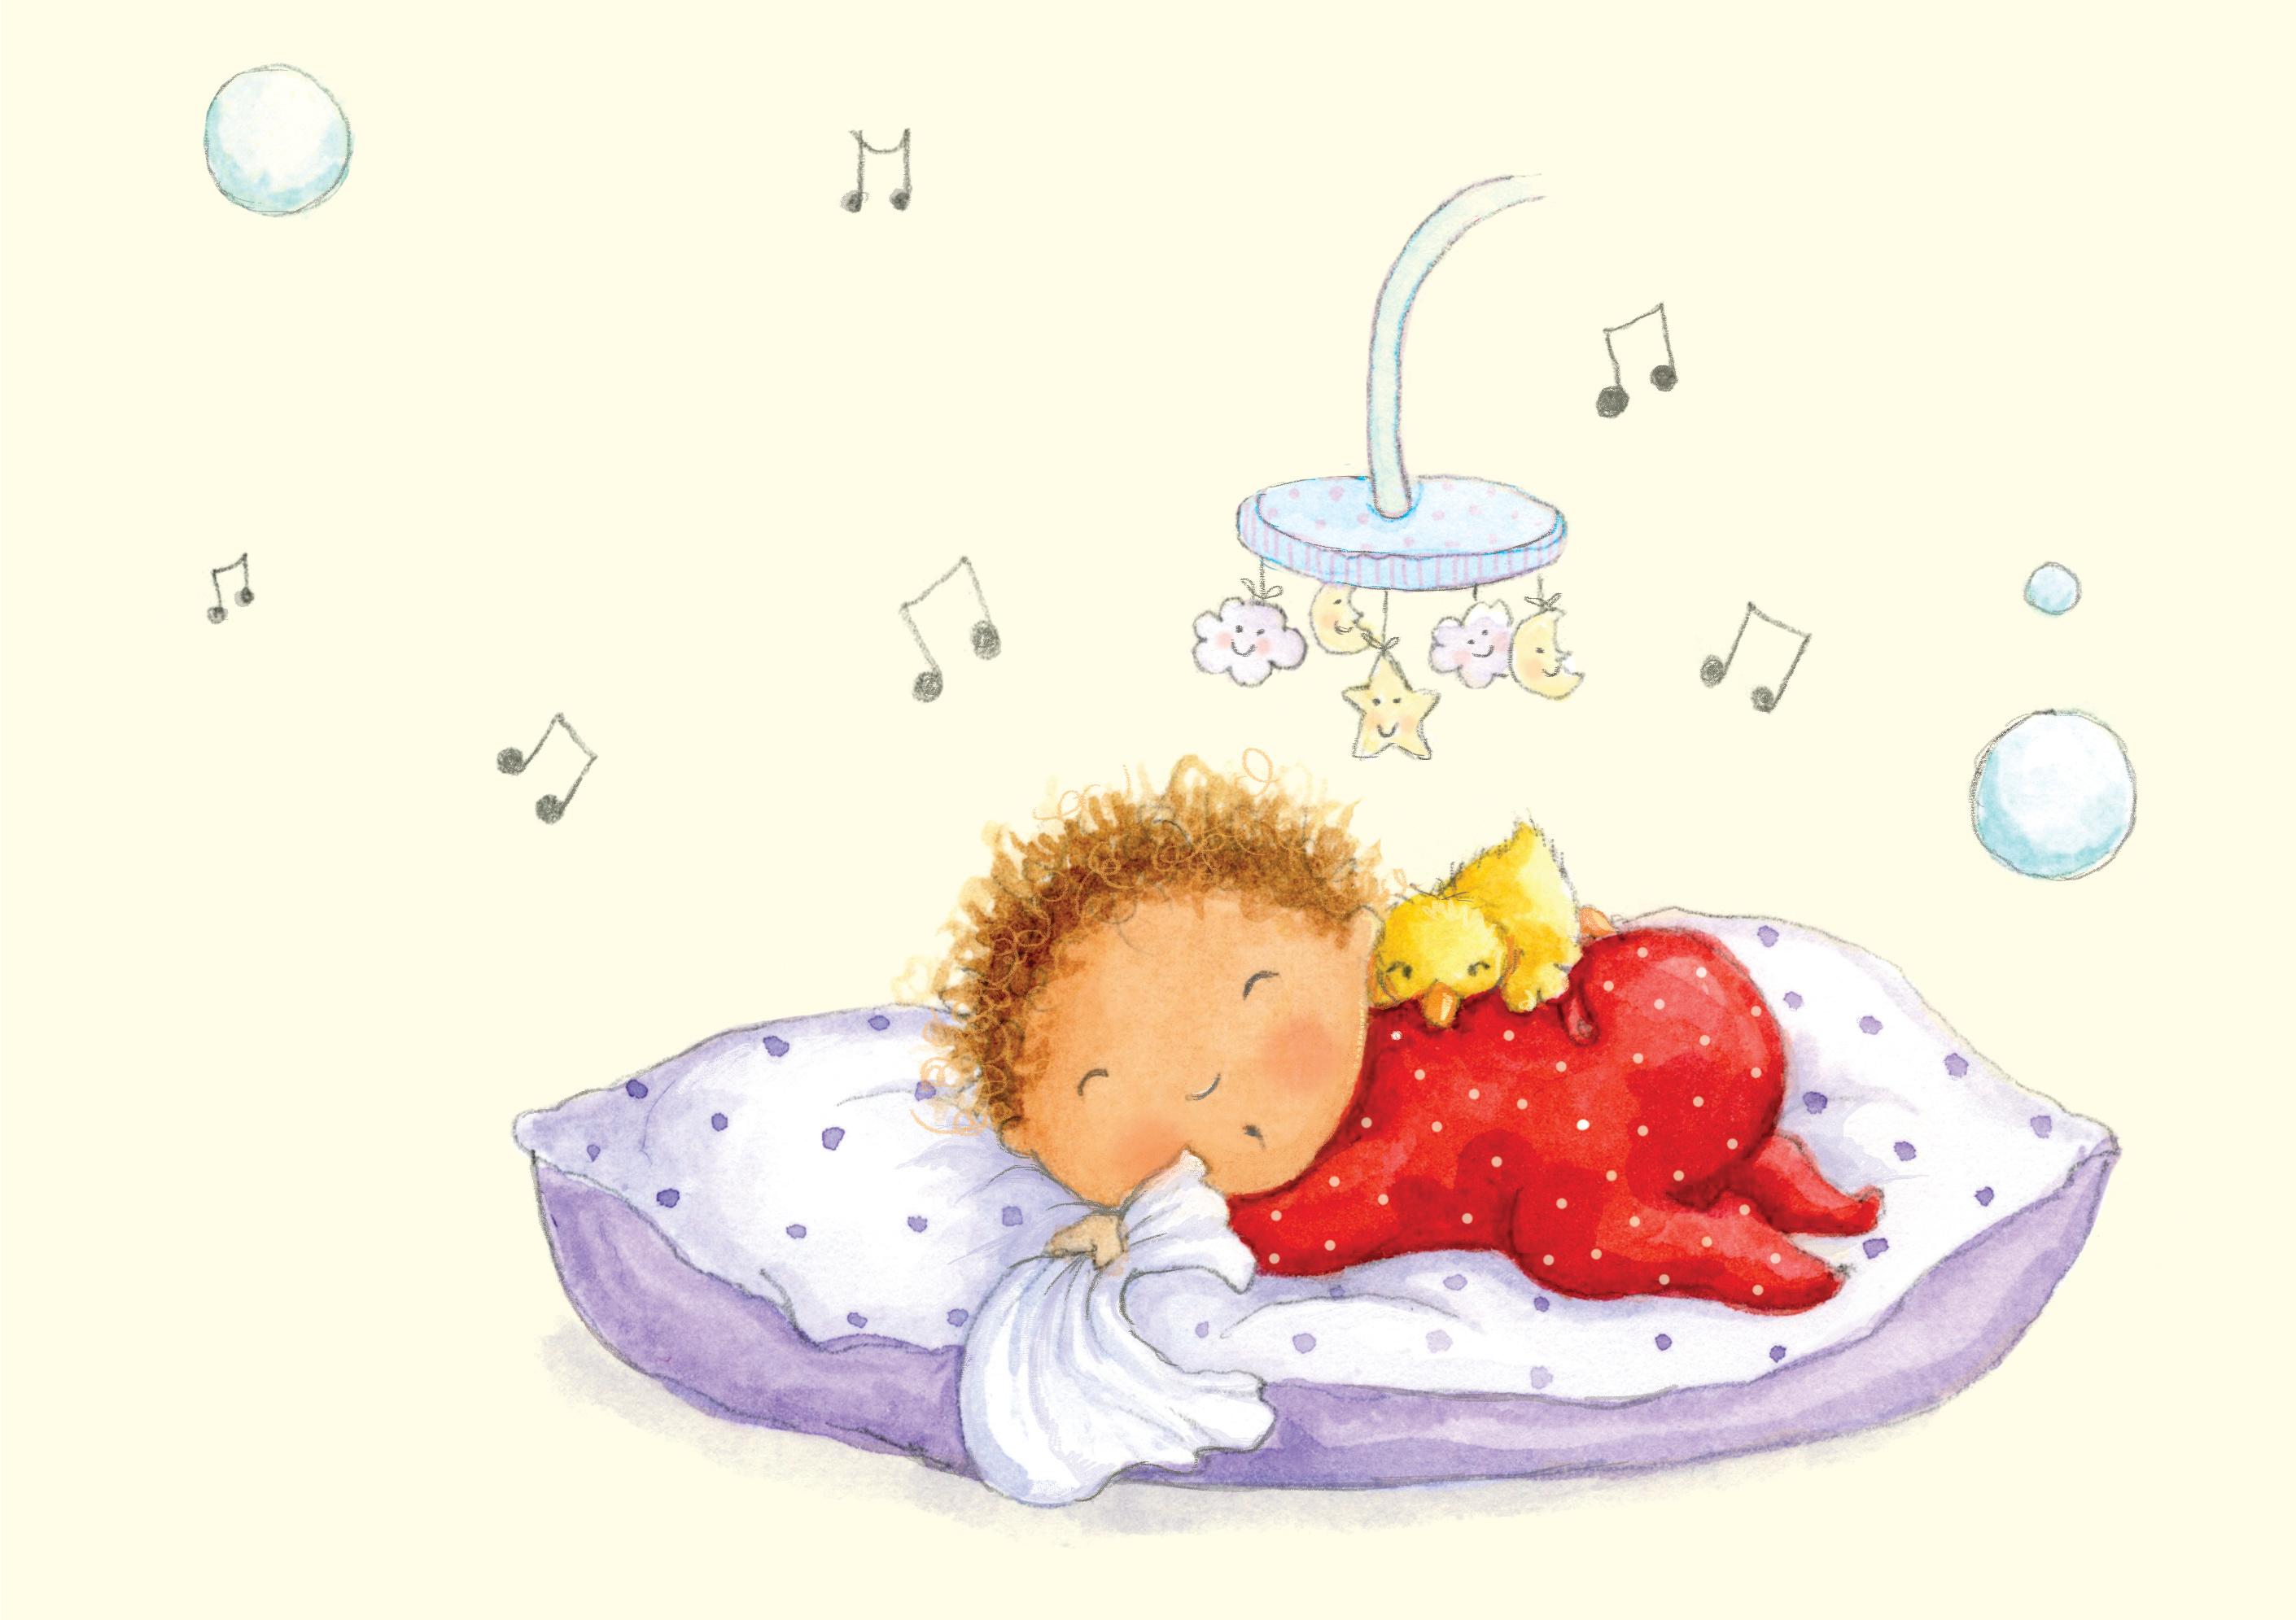 baby asleep_illustration_gail yerrill